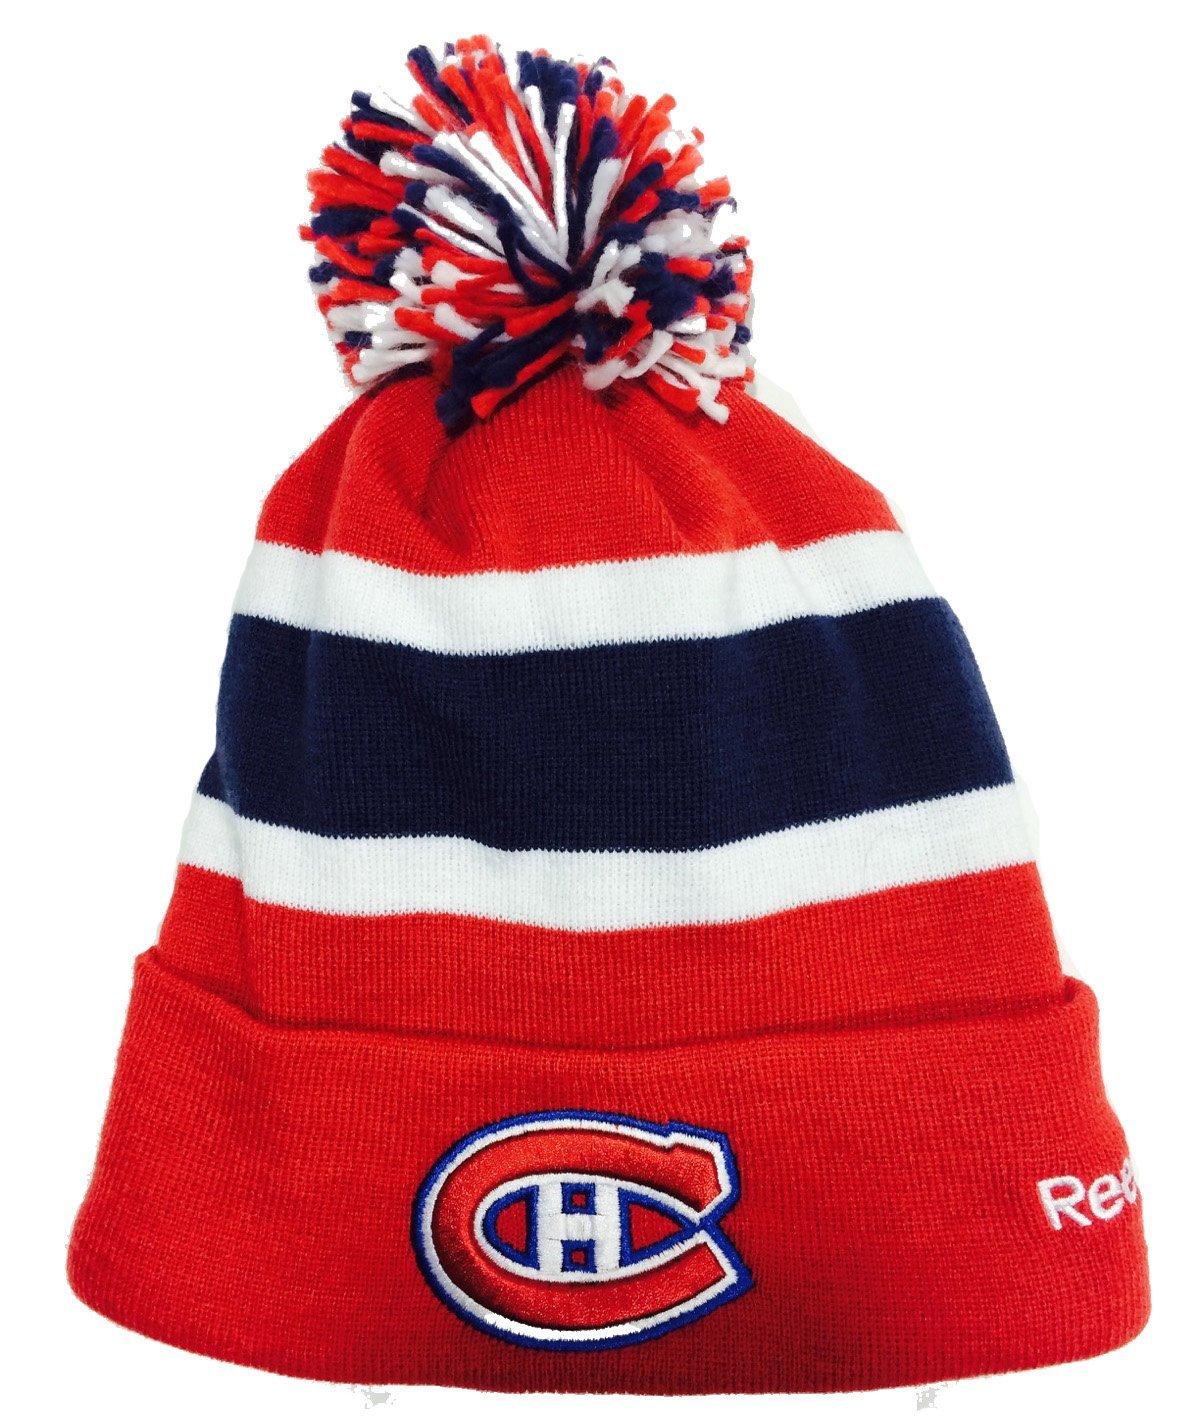 premium selection 91dcd 27ef5 Reebok Montreal Canadiens - Winter Hat